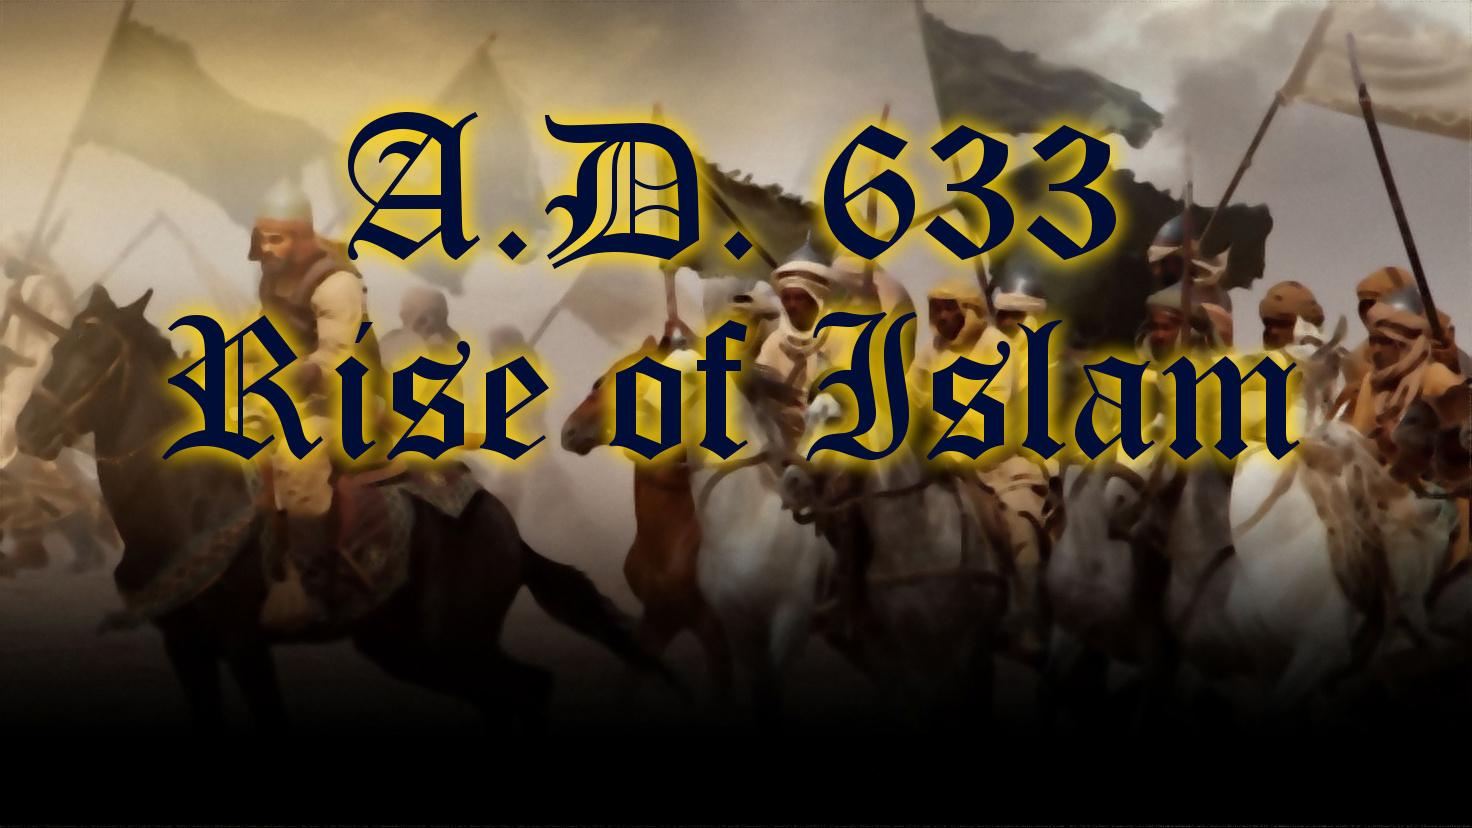 A D  633: Rise of Islam - Crusader Kings II mod released! news - Mod DB